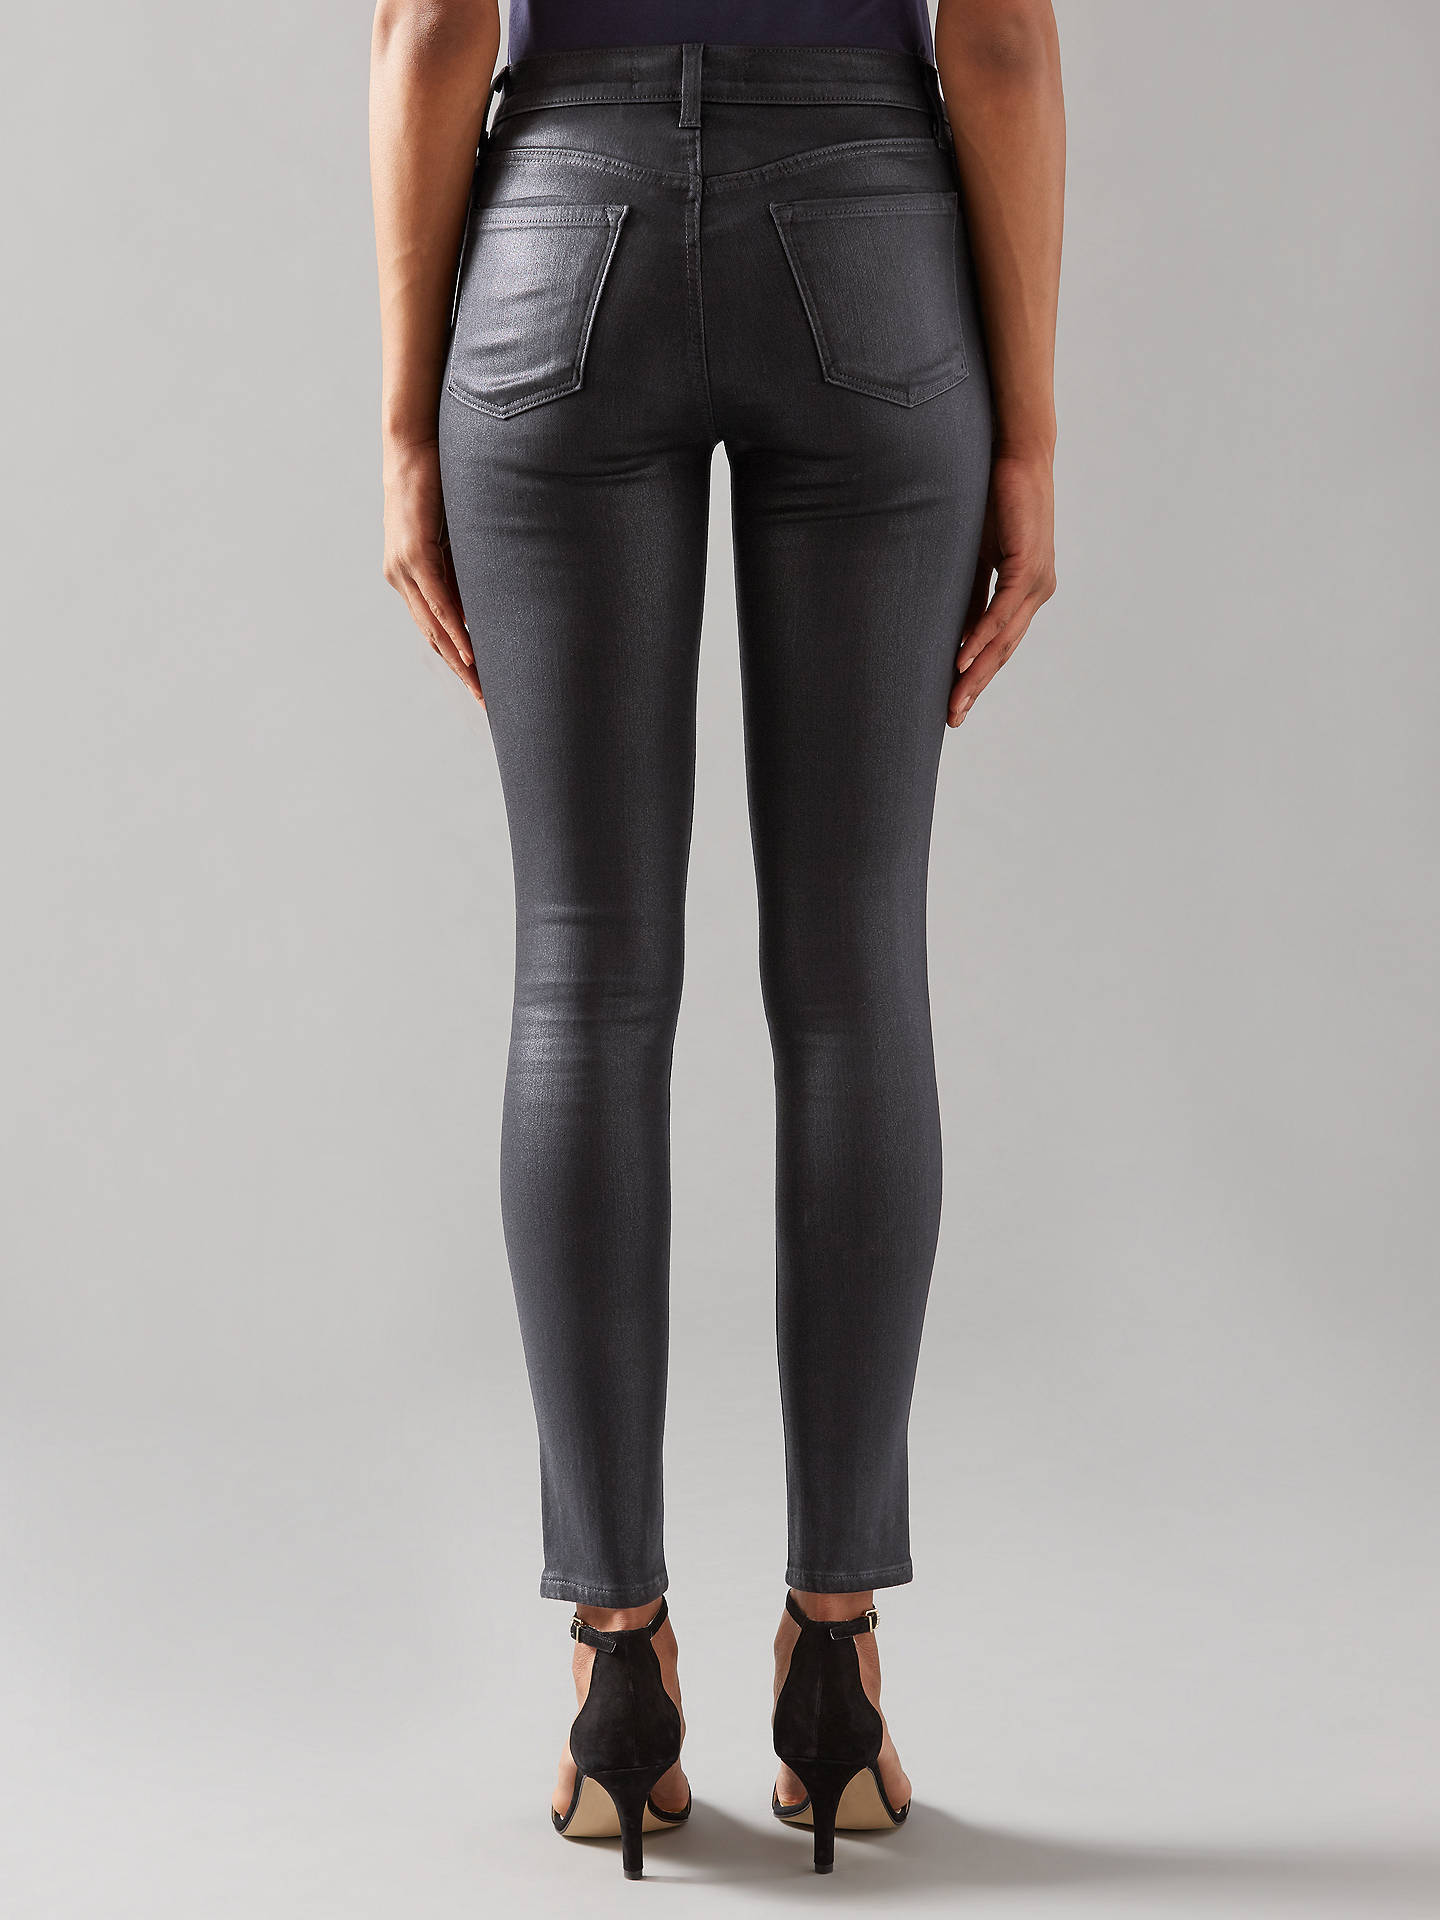 J Brand 620 Mid Rise Super Skinny Jeans, Fearless at John ...